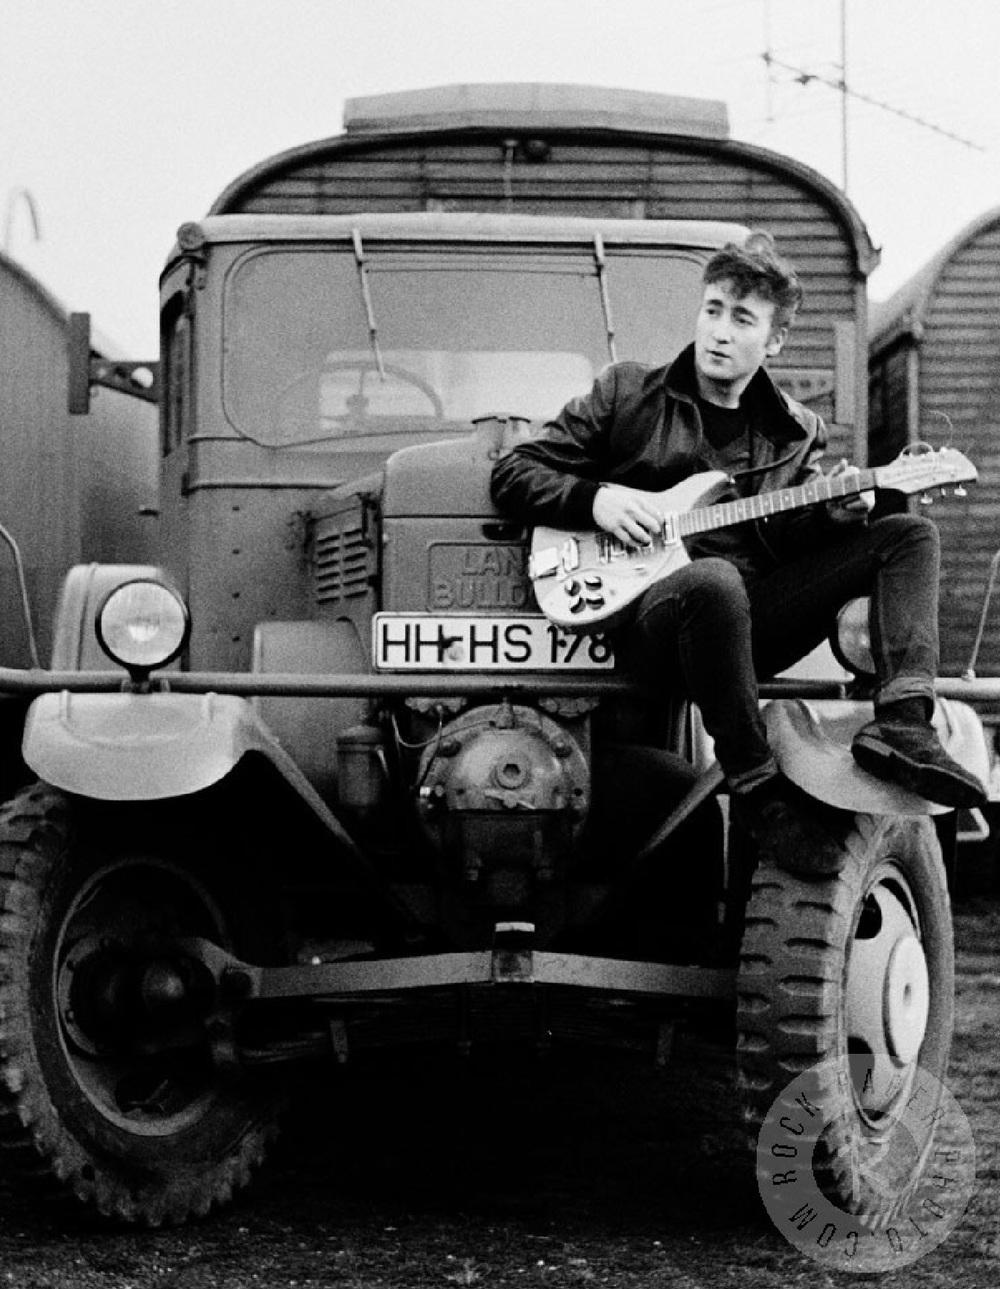 John Lennon in Hamburg, 1960. Photo by Astrid Kirchherr.